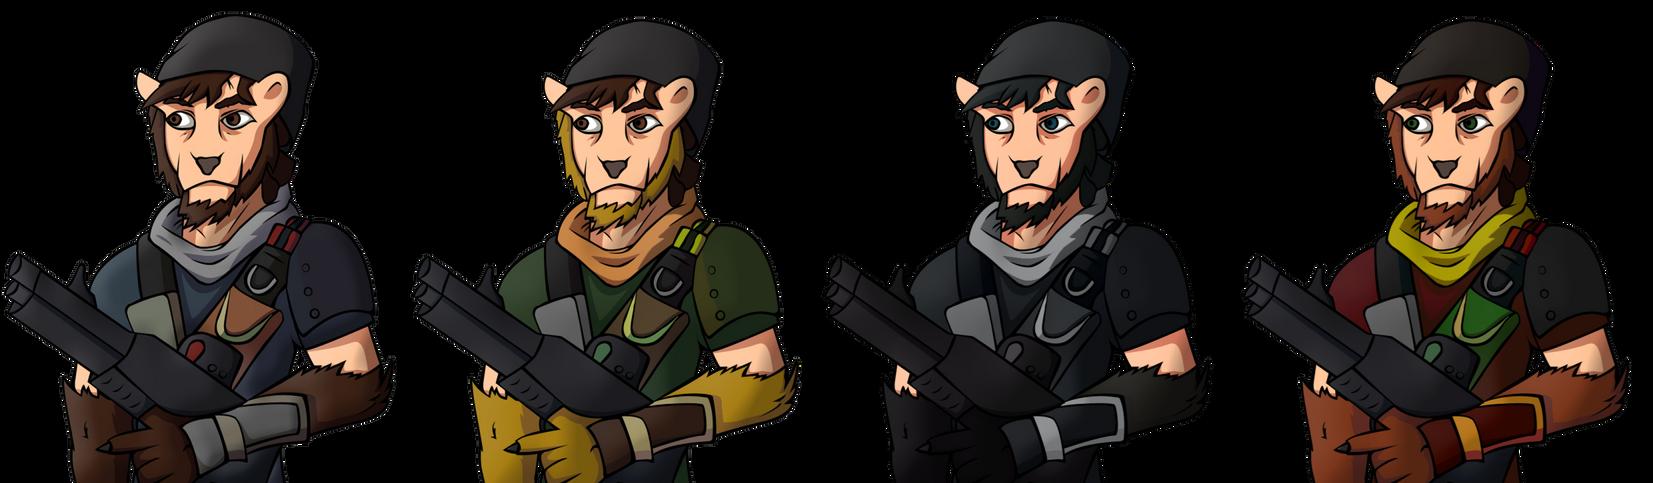 Avatar designs by Fonzzz002